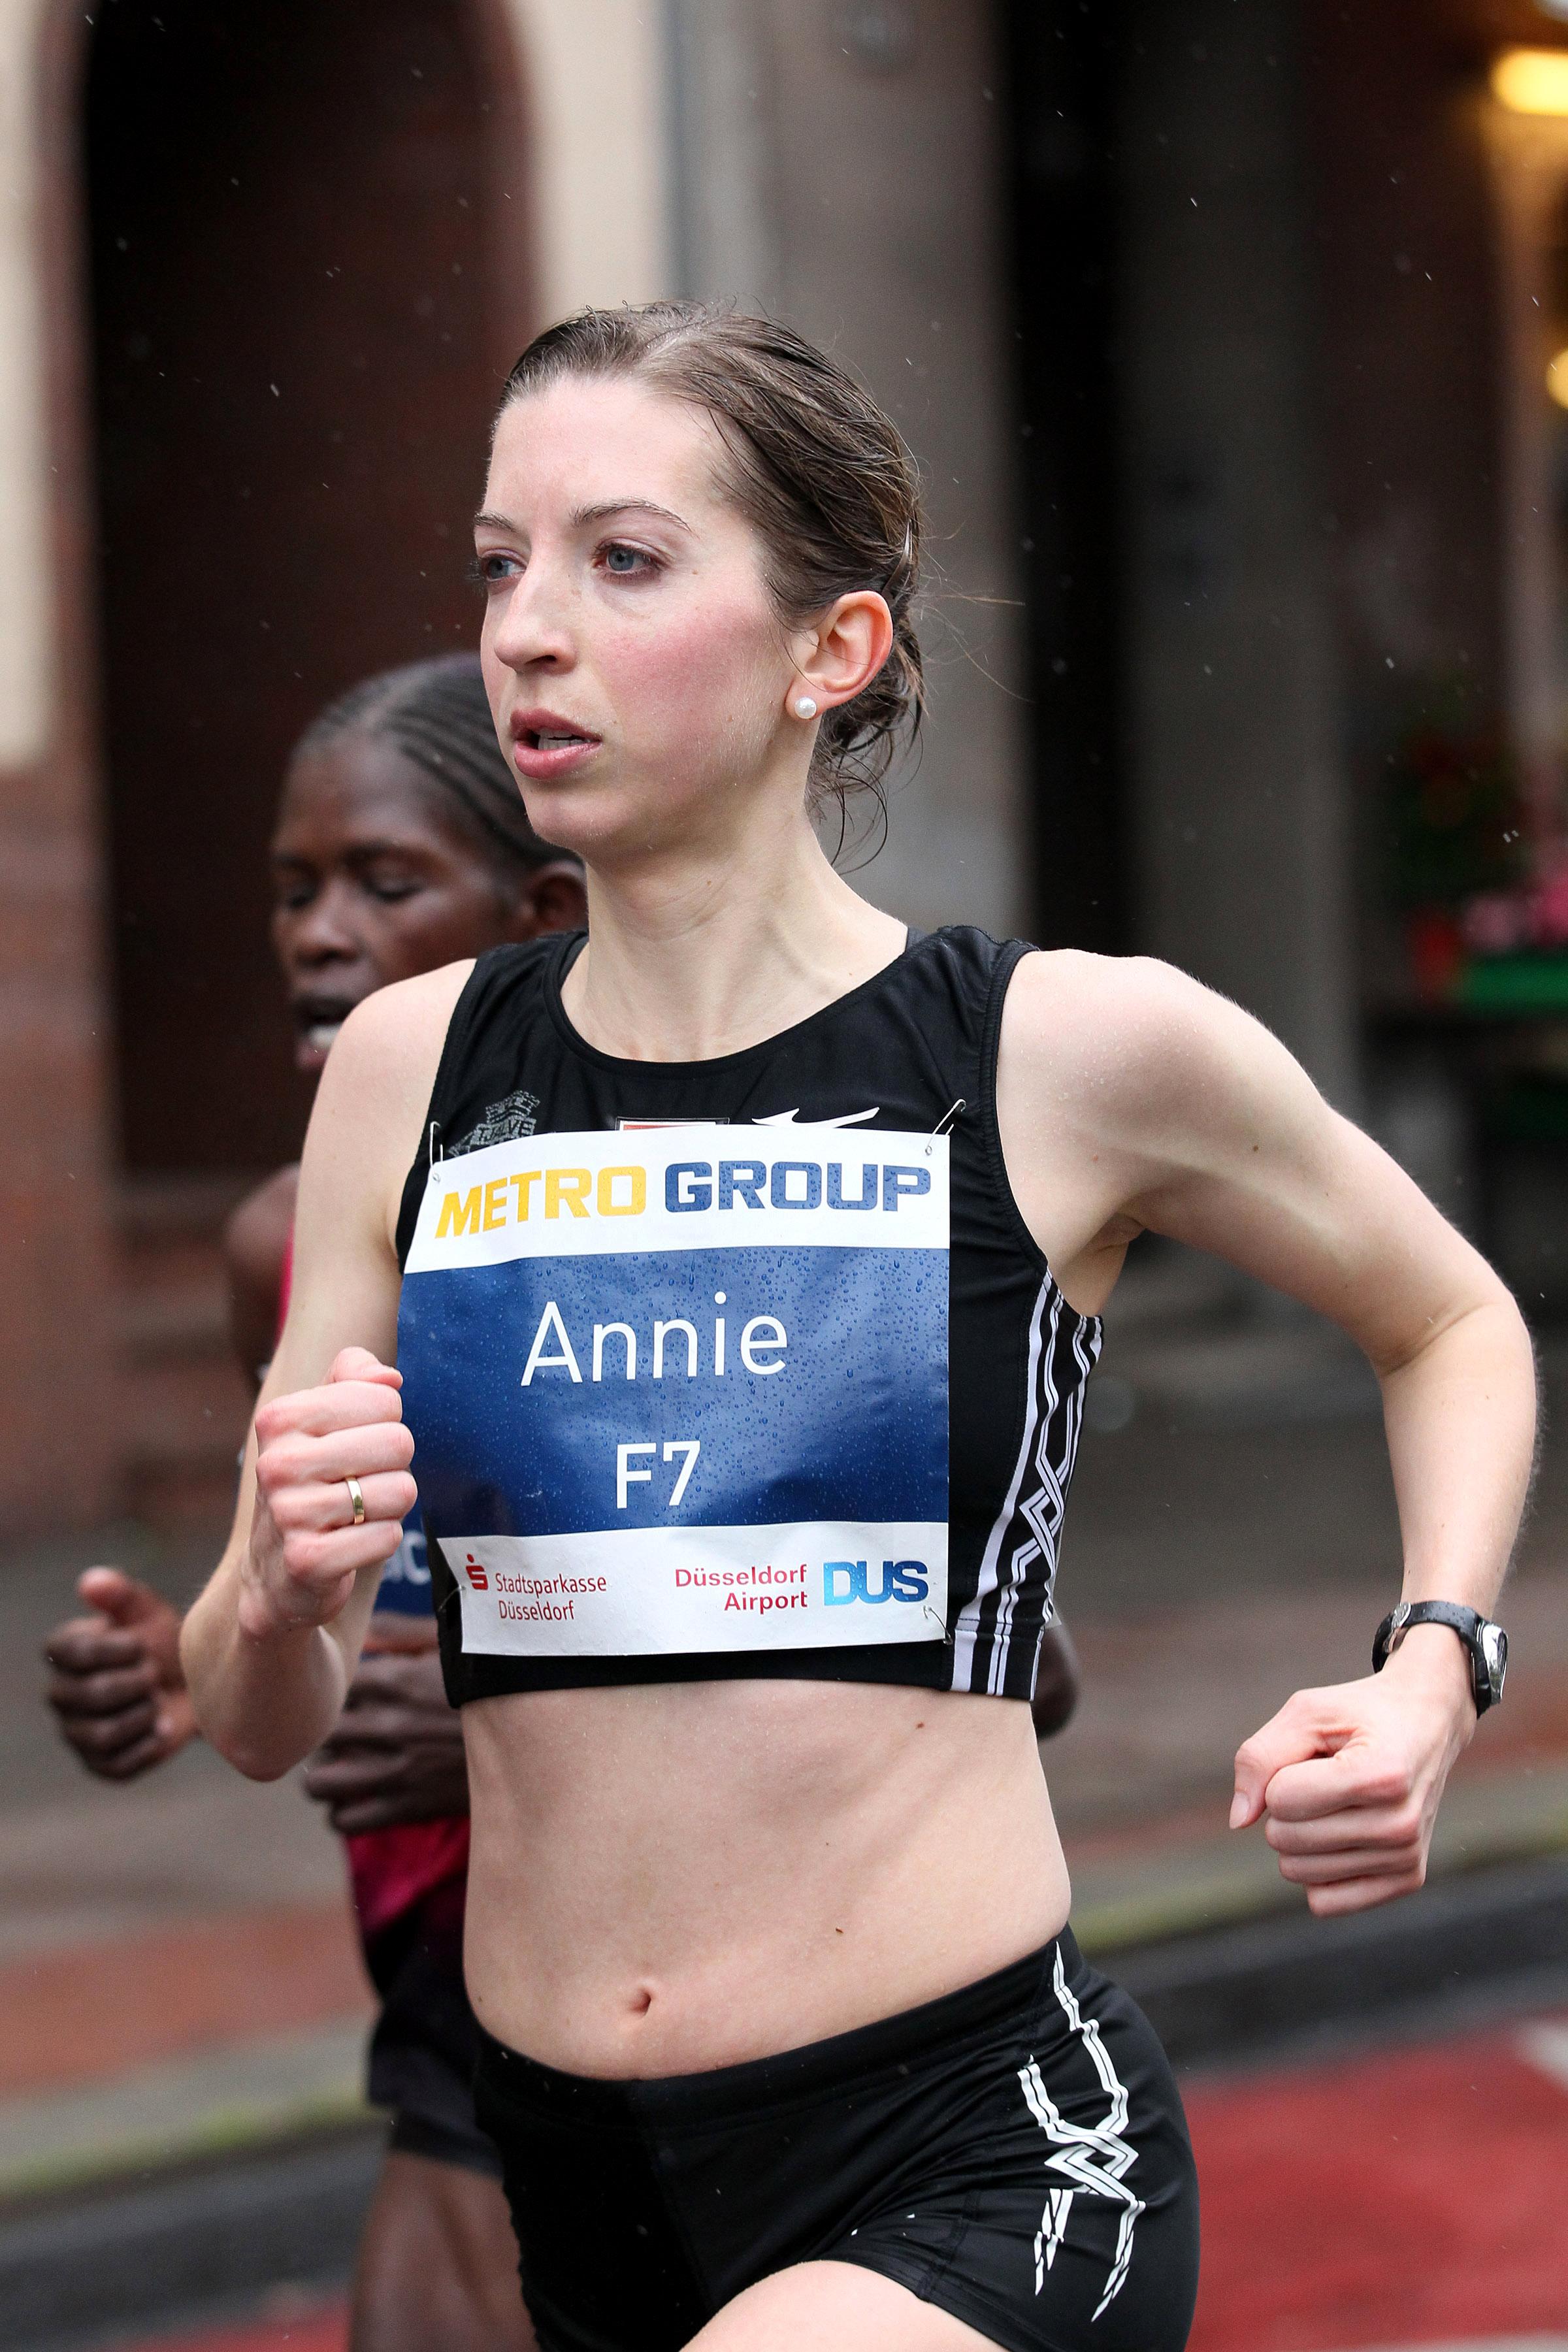 090b0bf477 Annie Bersagel The Unlikeliest Of Contenders At Olympic Trials Marathon